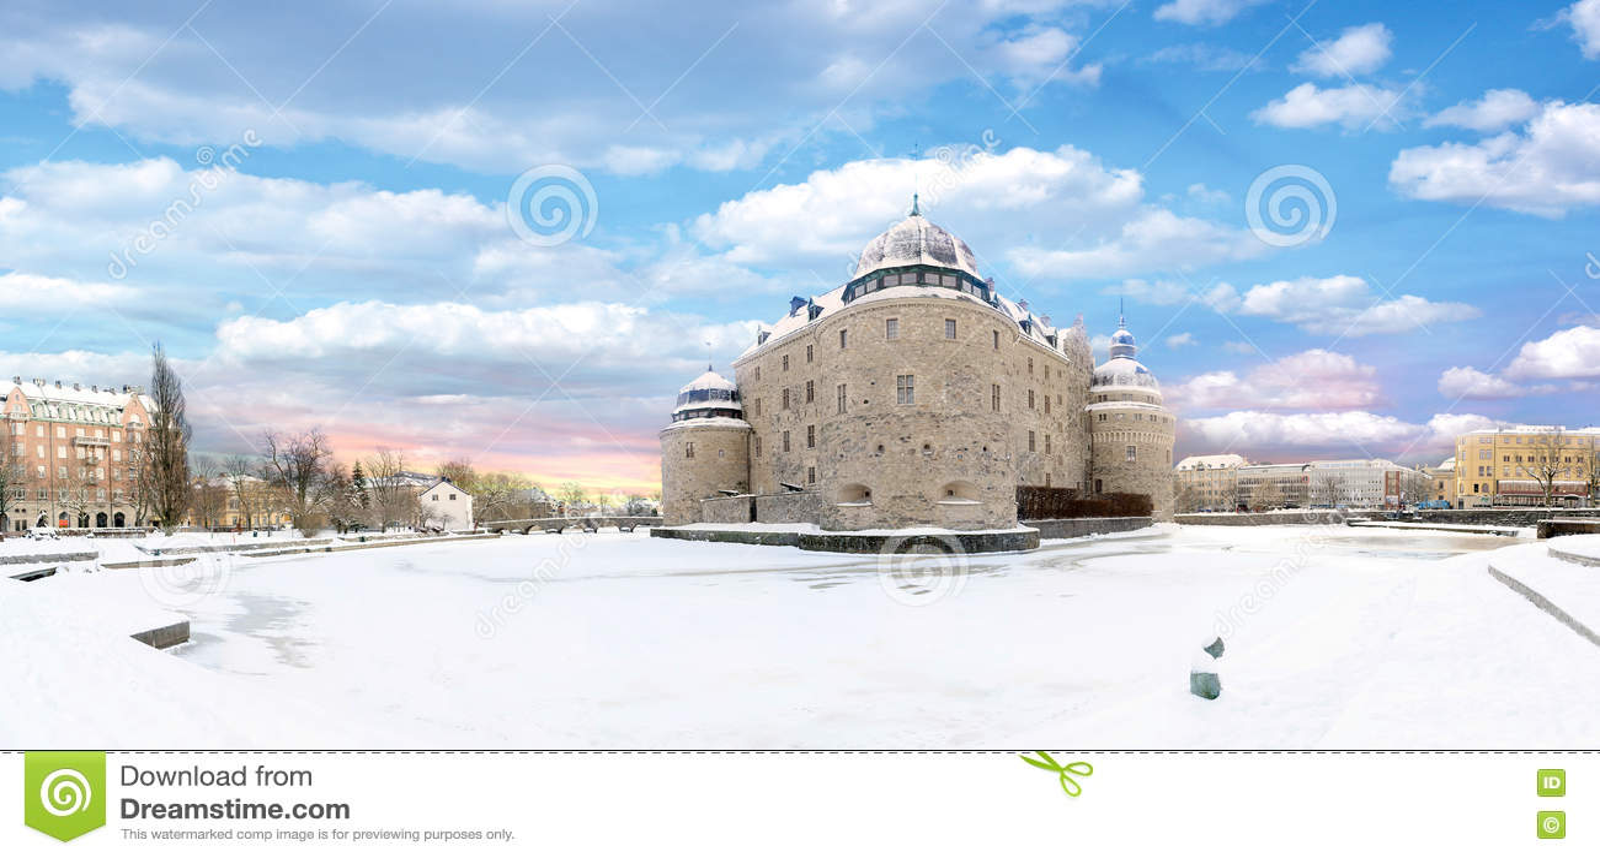 Castelo de Orebro